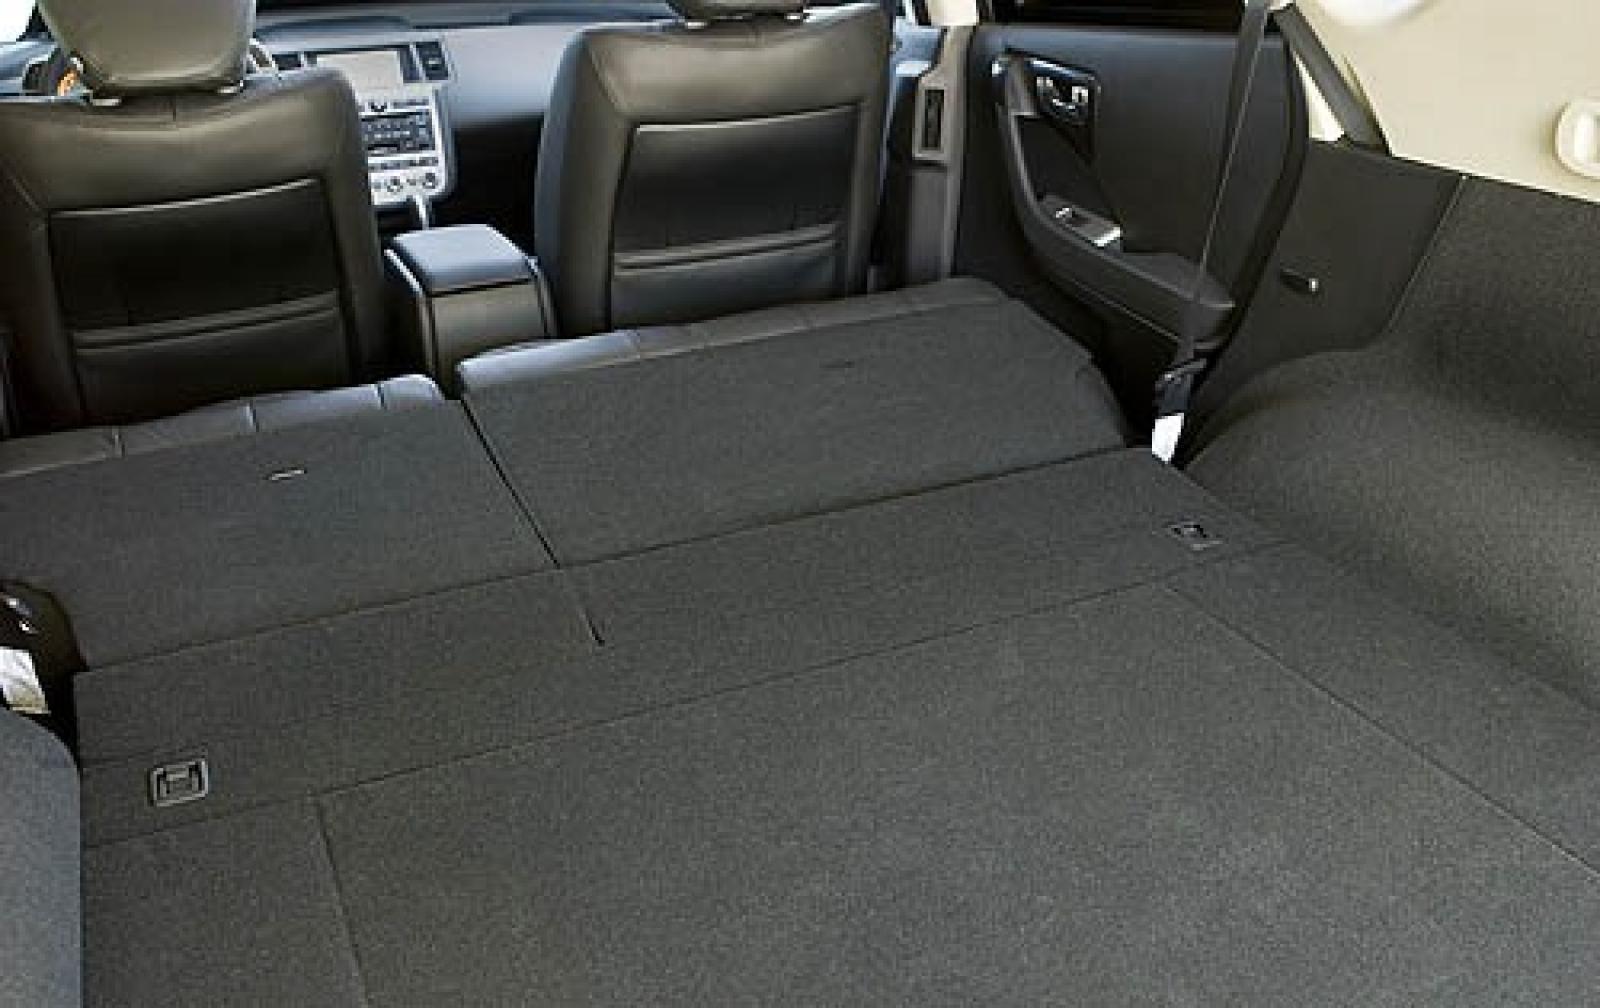 ... 2006 Nissan Murano SL Cen Interior #6 800 1024 1280 1600 Origin ...